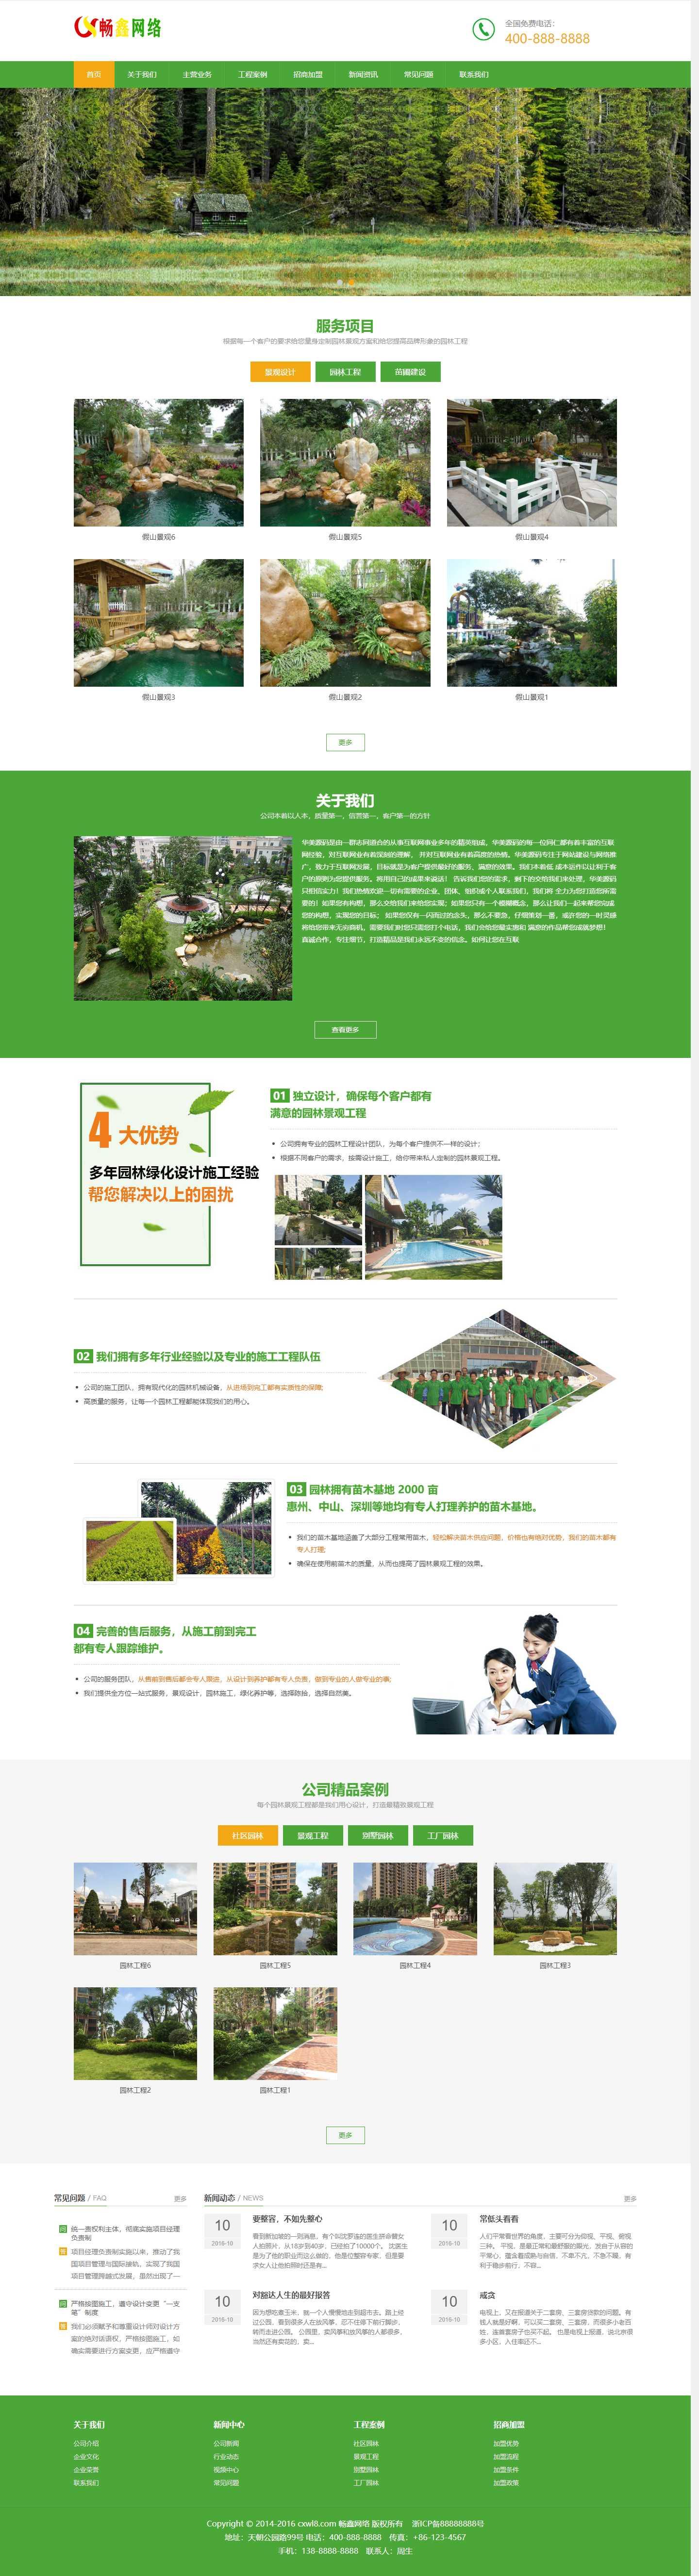 【J029】清新园林环境网站模板